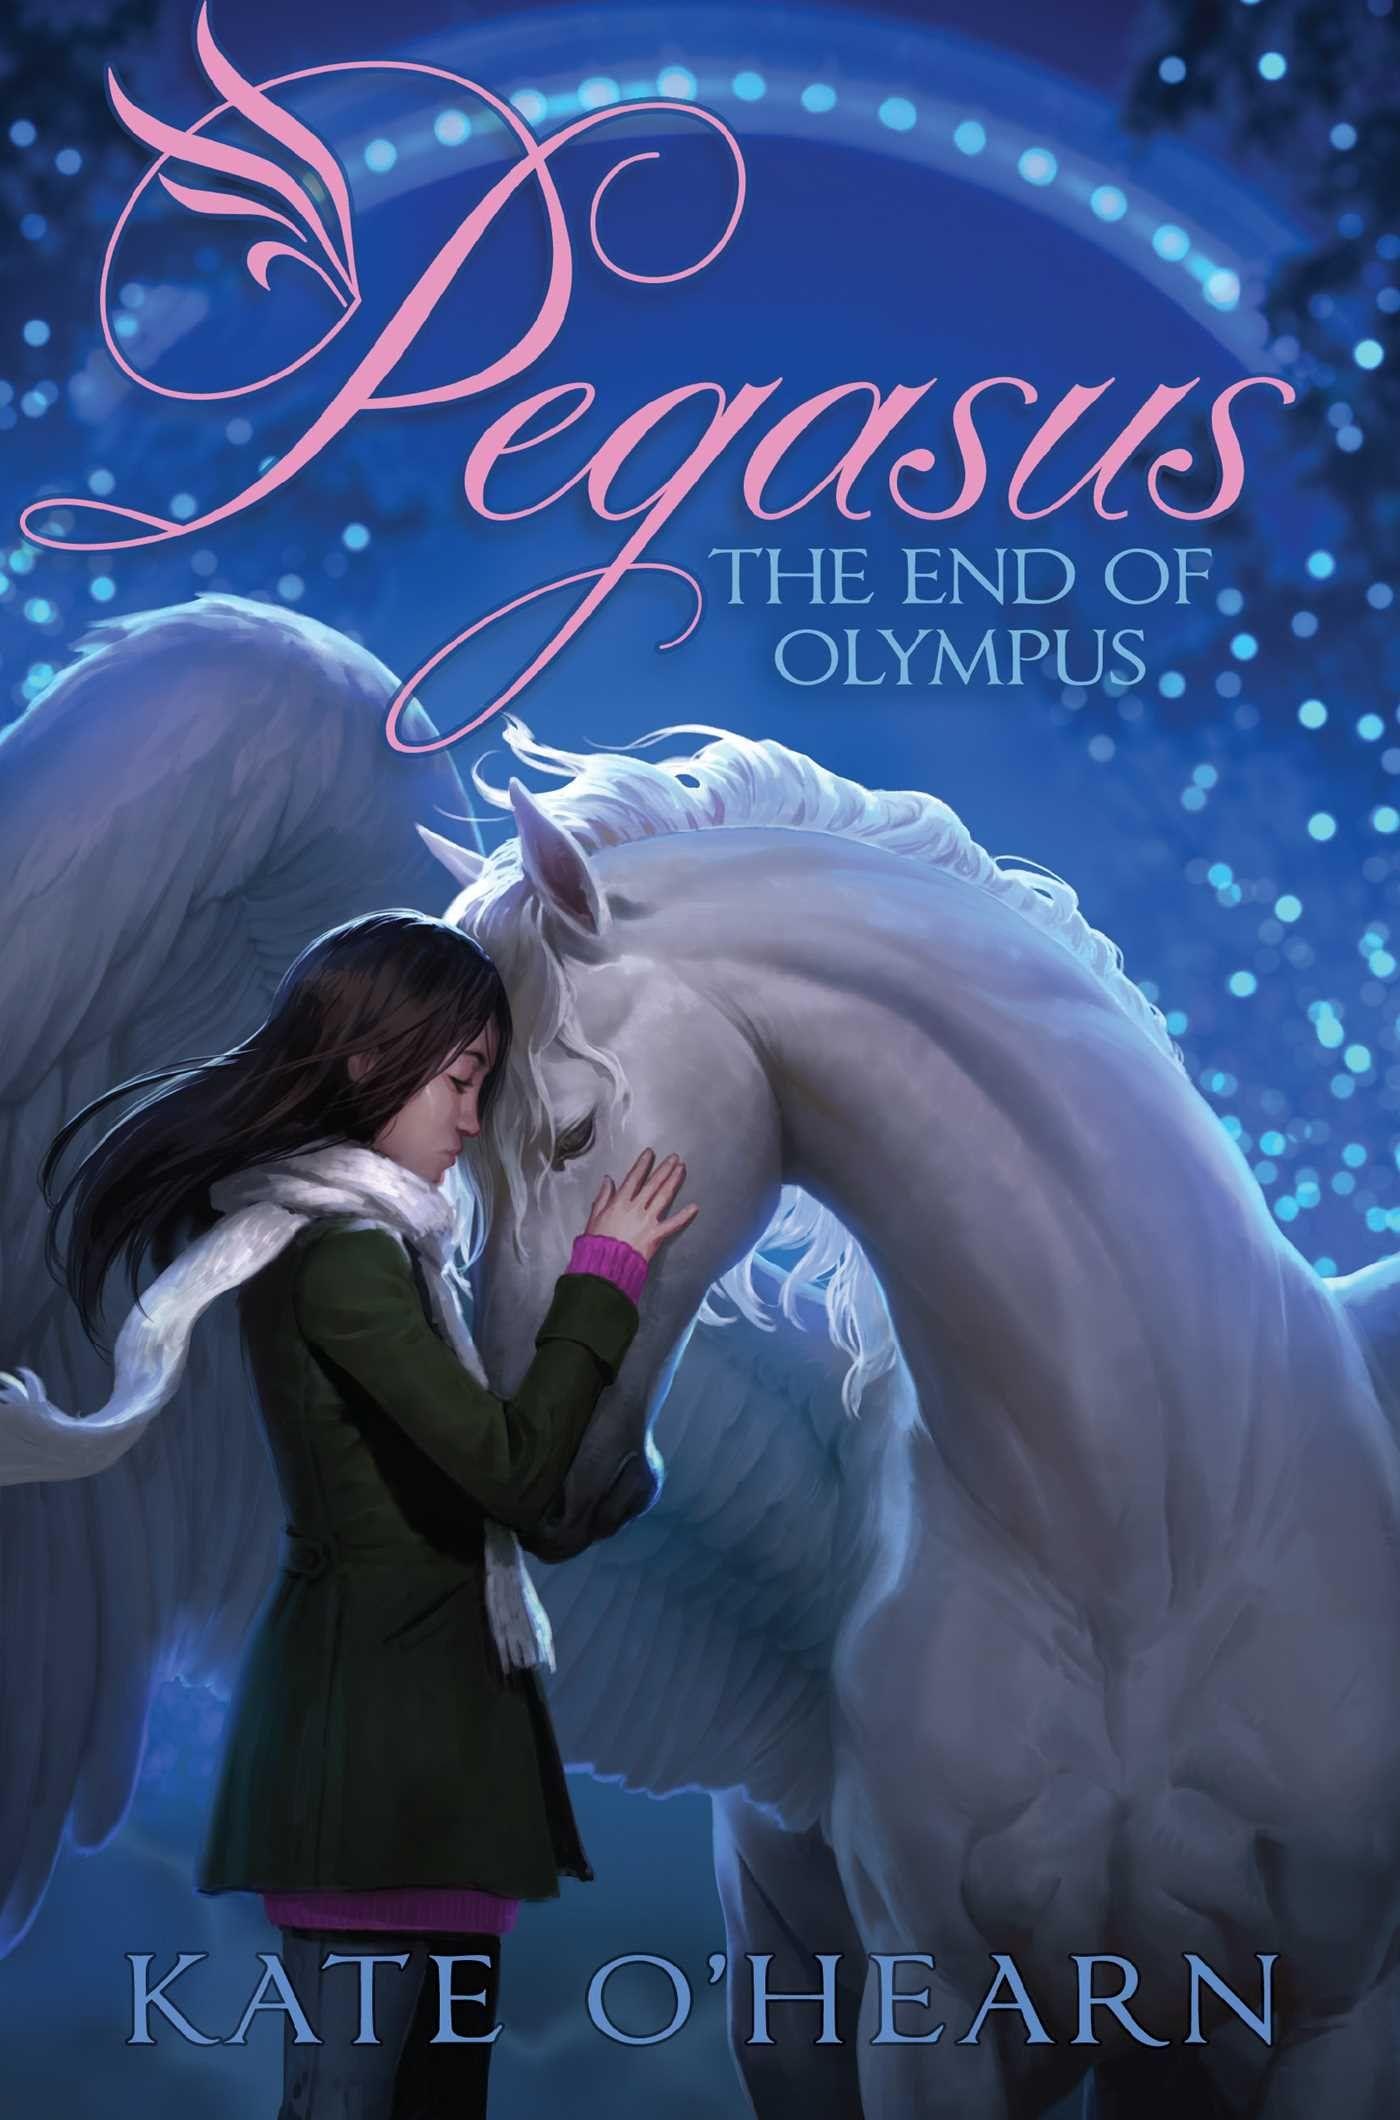 The End Of Olympus (pegasus): Kate O'hearn: 9781481447171: Amazonsmile